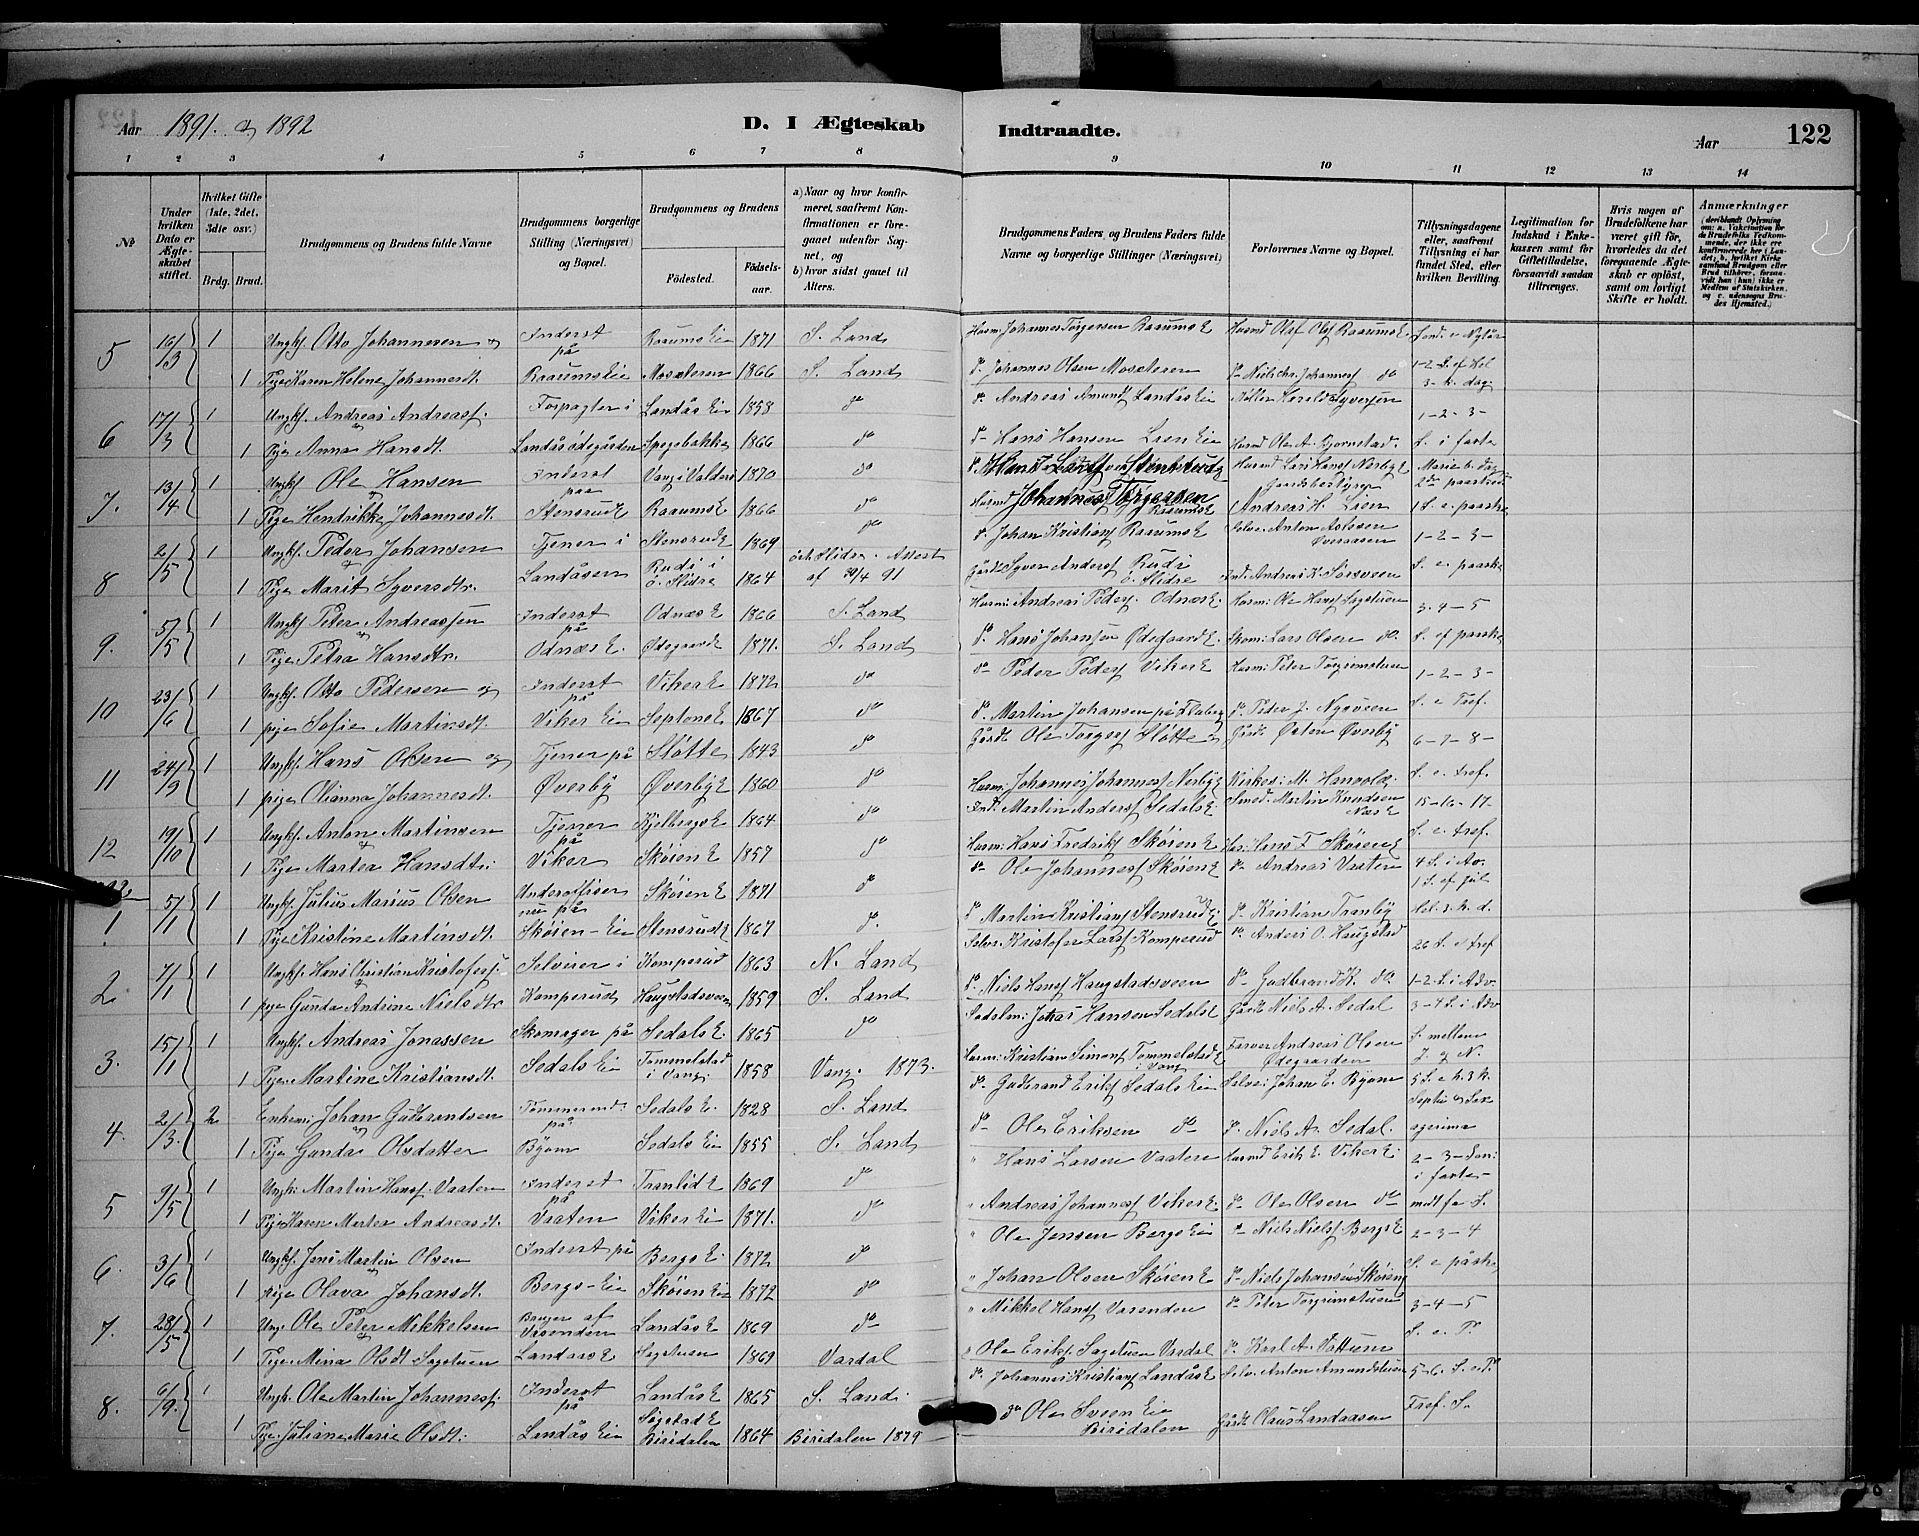 SAH, Søndre Land prestekontor, L/L0003: Klokkerbok nr. 3, 1884-1902, s. 122